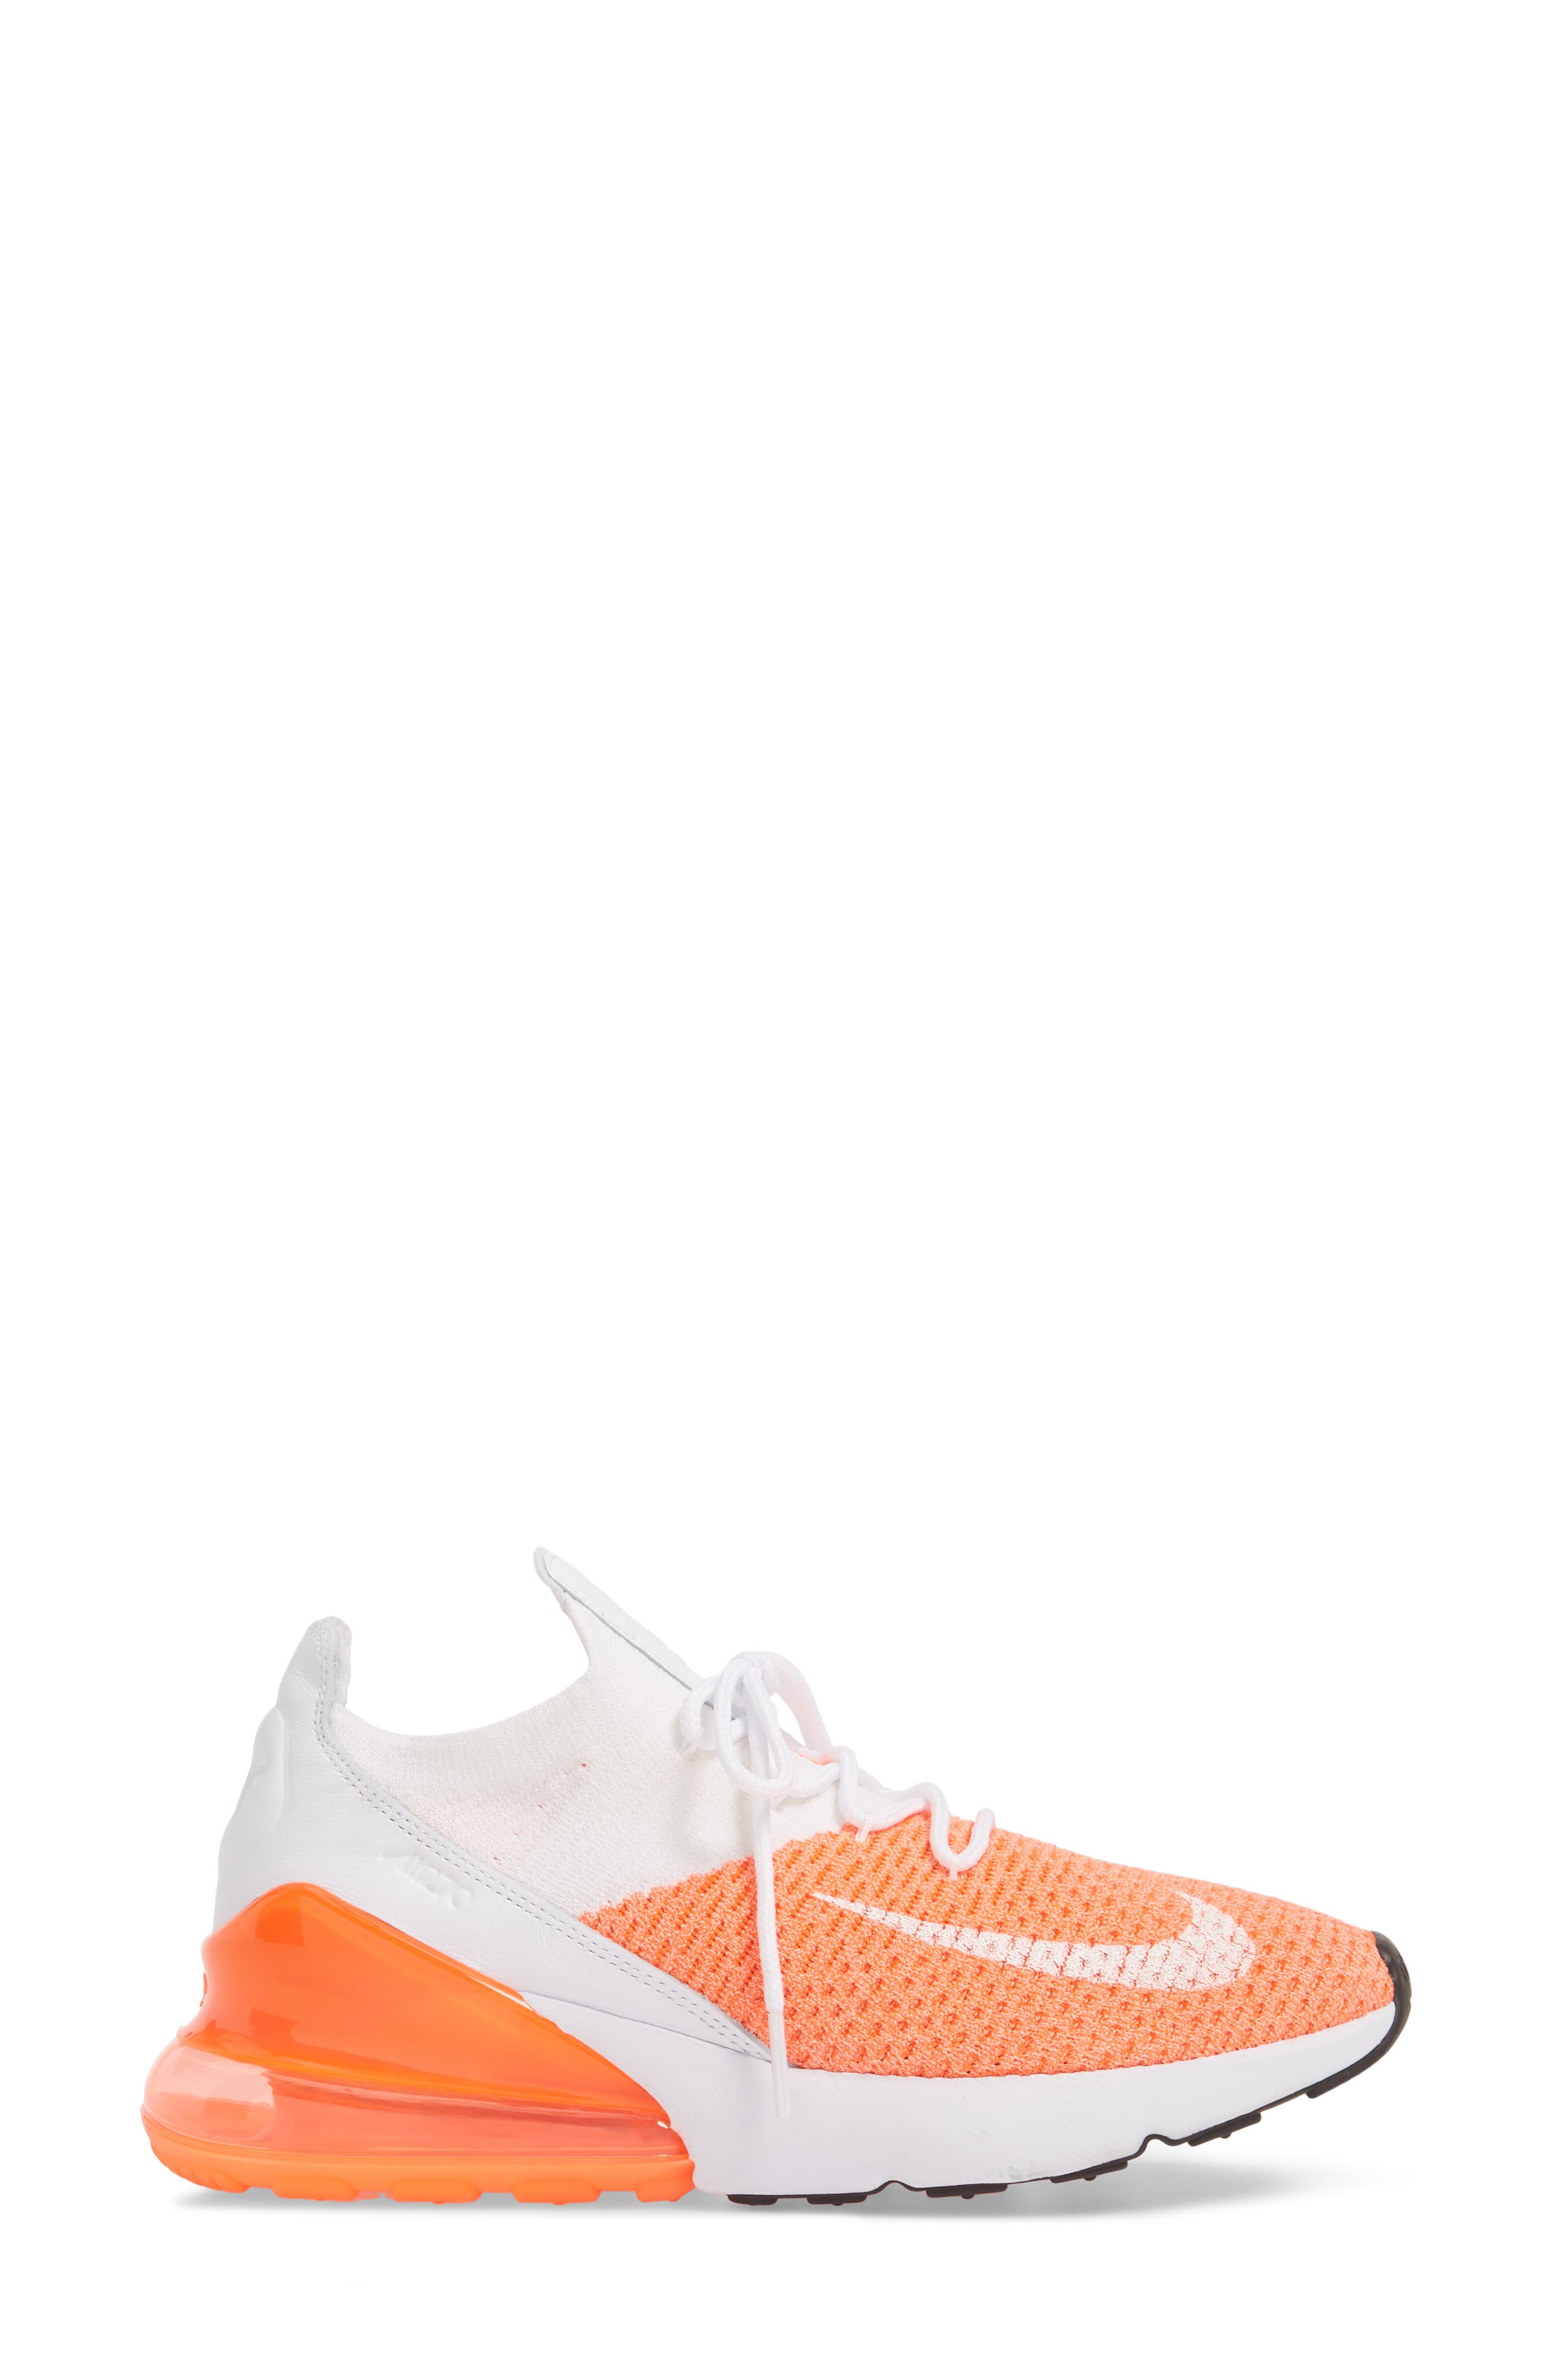 Air Max 270 Flyknit Sneaker,                             Alternate thumbnail 21, color,